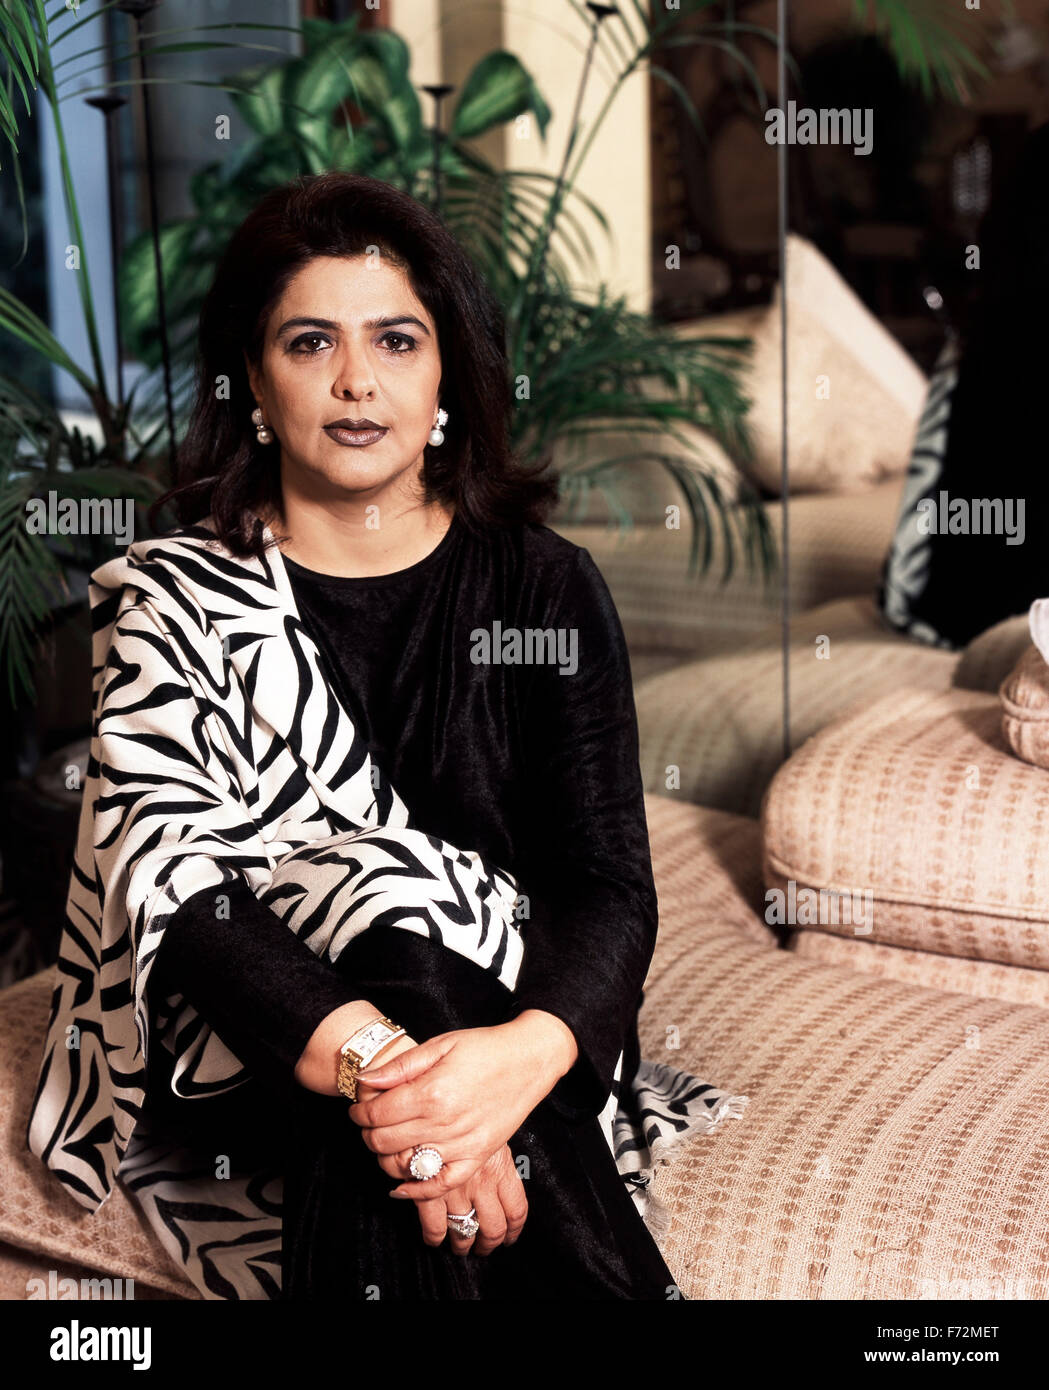 Pinky roshan mother of hrithik roshan, india, asia, 2002 - Stock Image